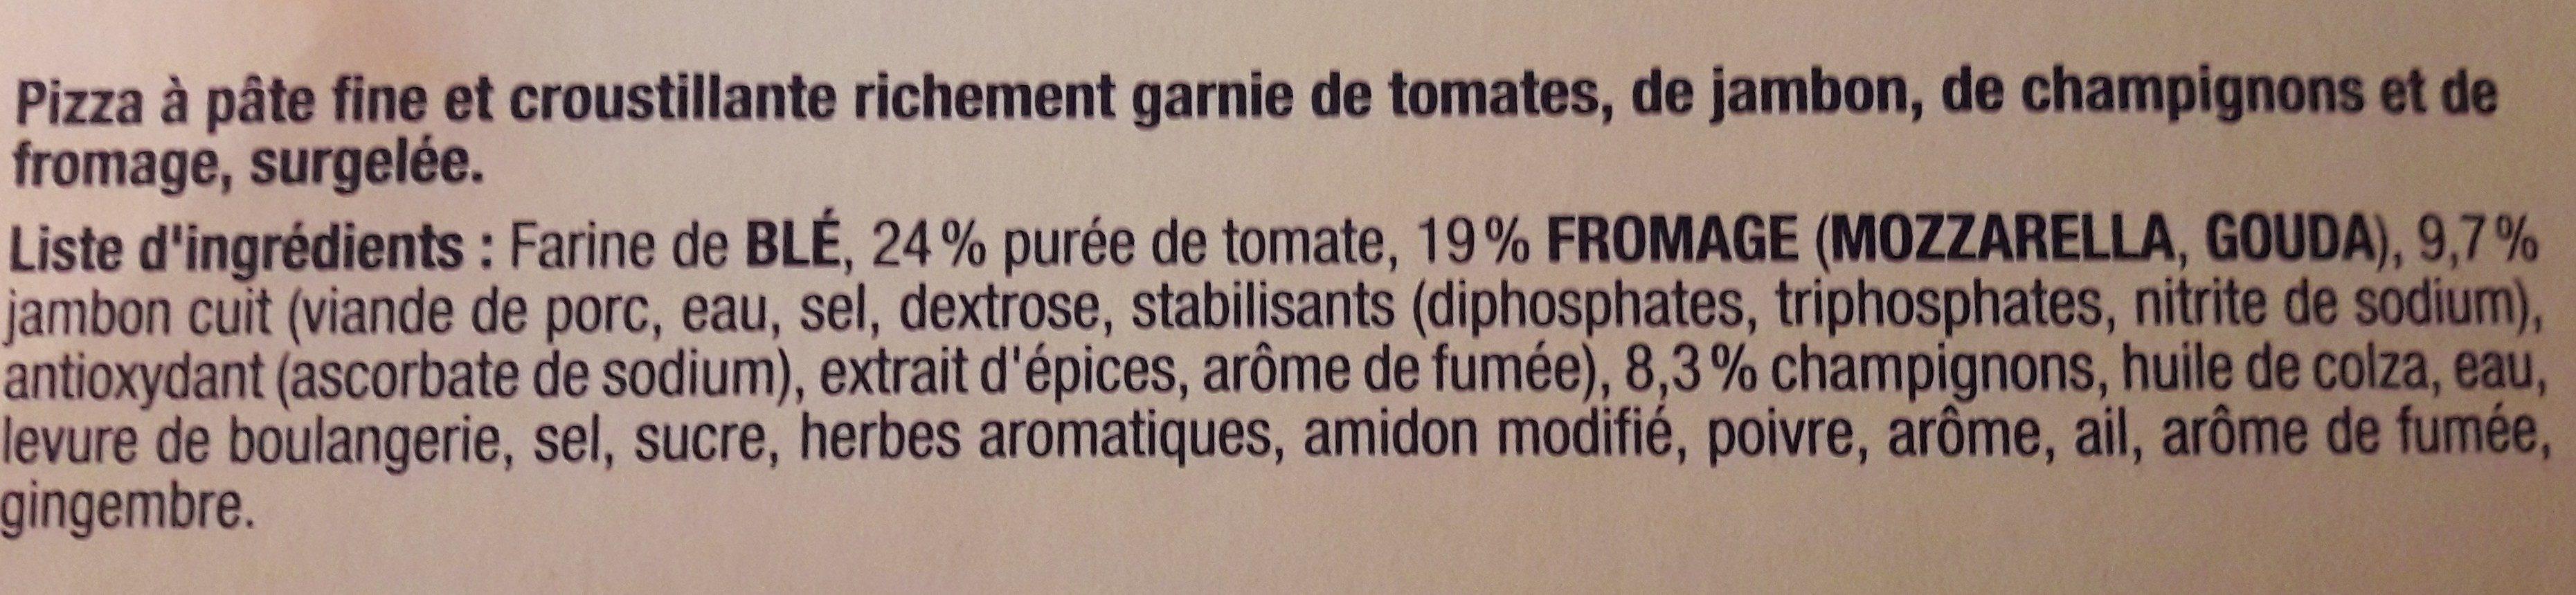 Ristorante Pizza royale - Ingrediënten - fr